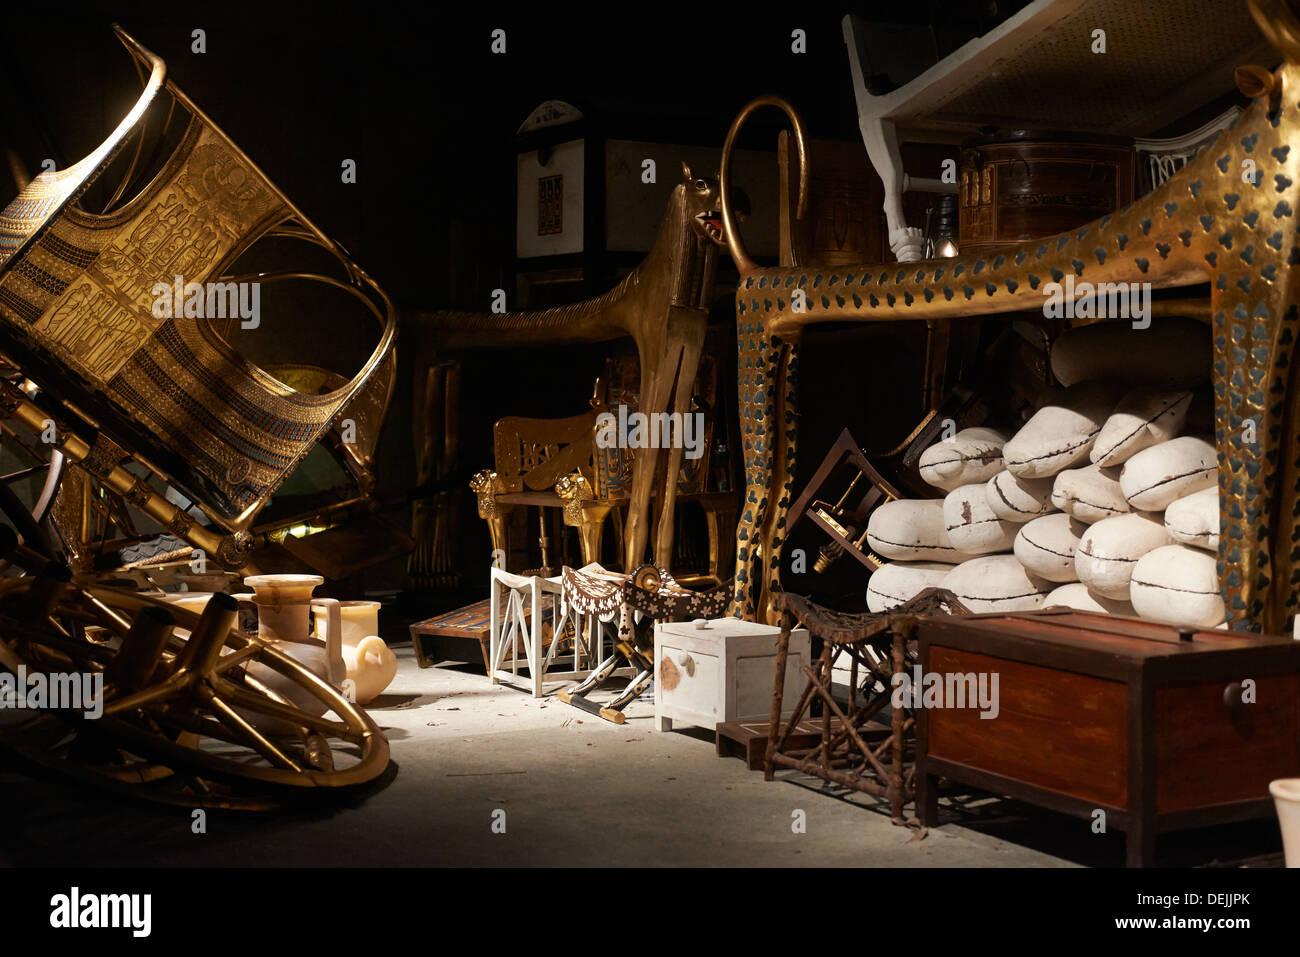 Tutankhamun-His-Tomb-And-His-Treasures - History Arch |King Tut And His Treasures